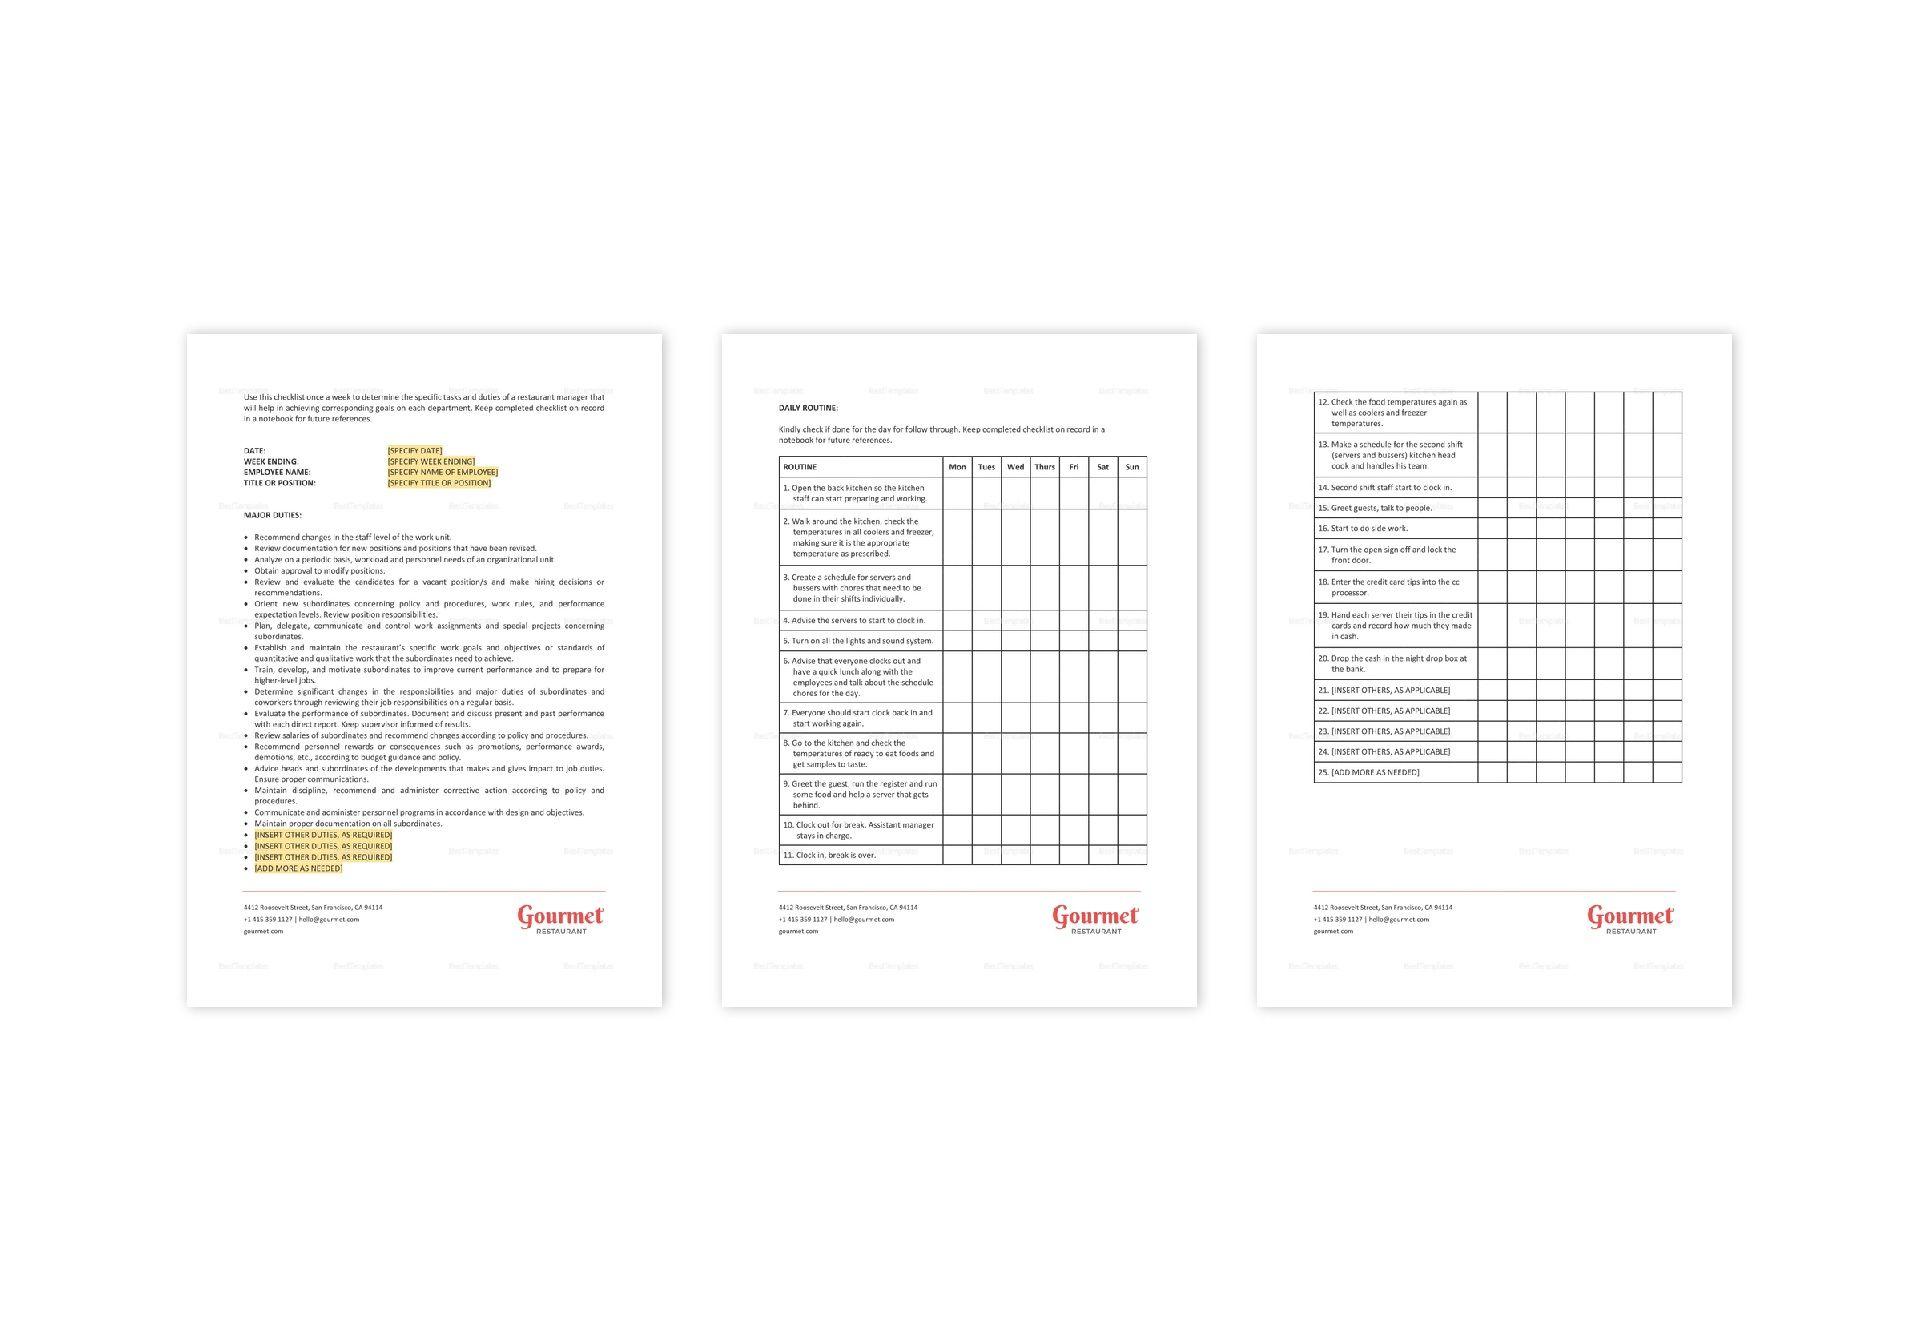 Restaurant Routine Managerial Duties Checklist Template in